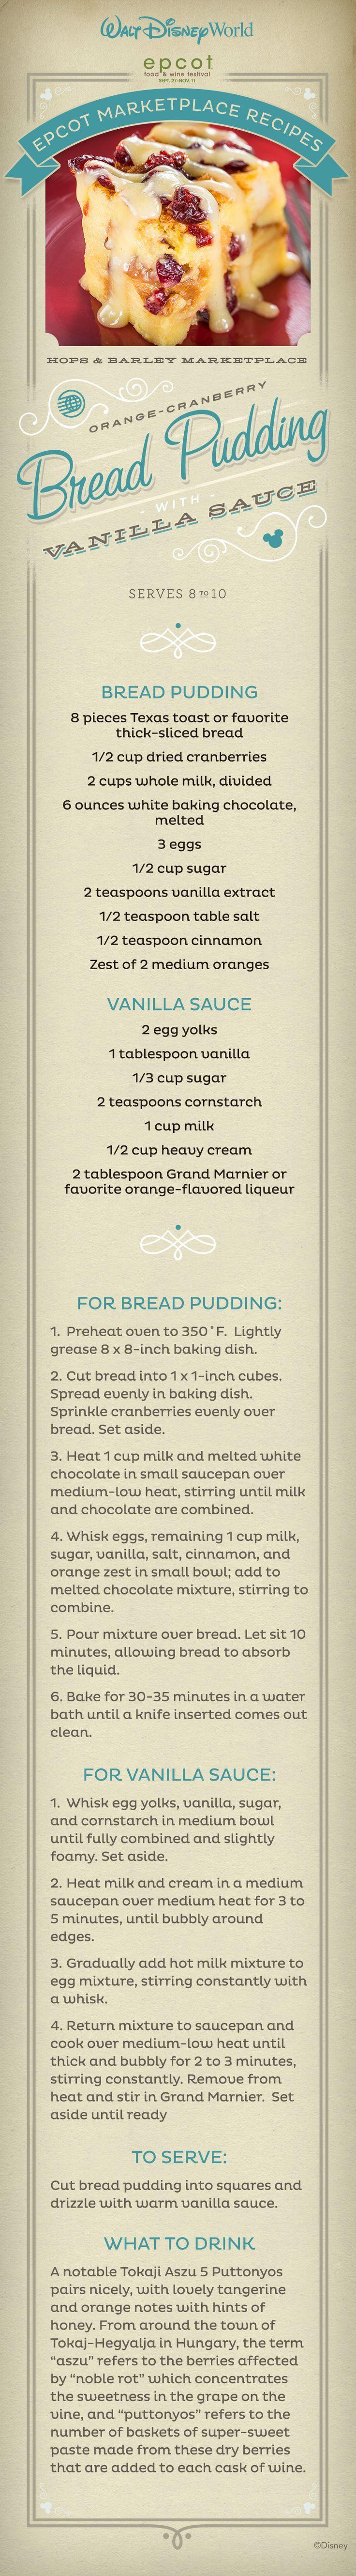 Disney's Orange-Cranberry Bread Pudding #recipe with Vanilla Sauce